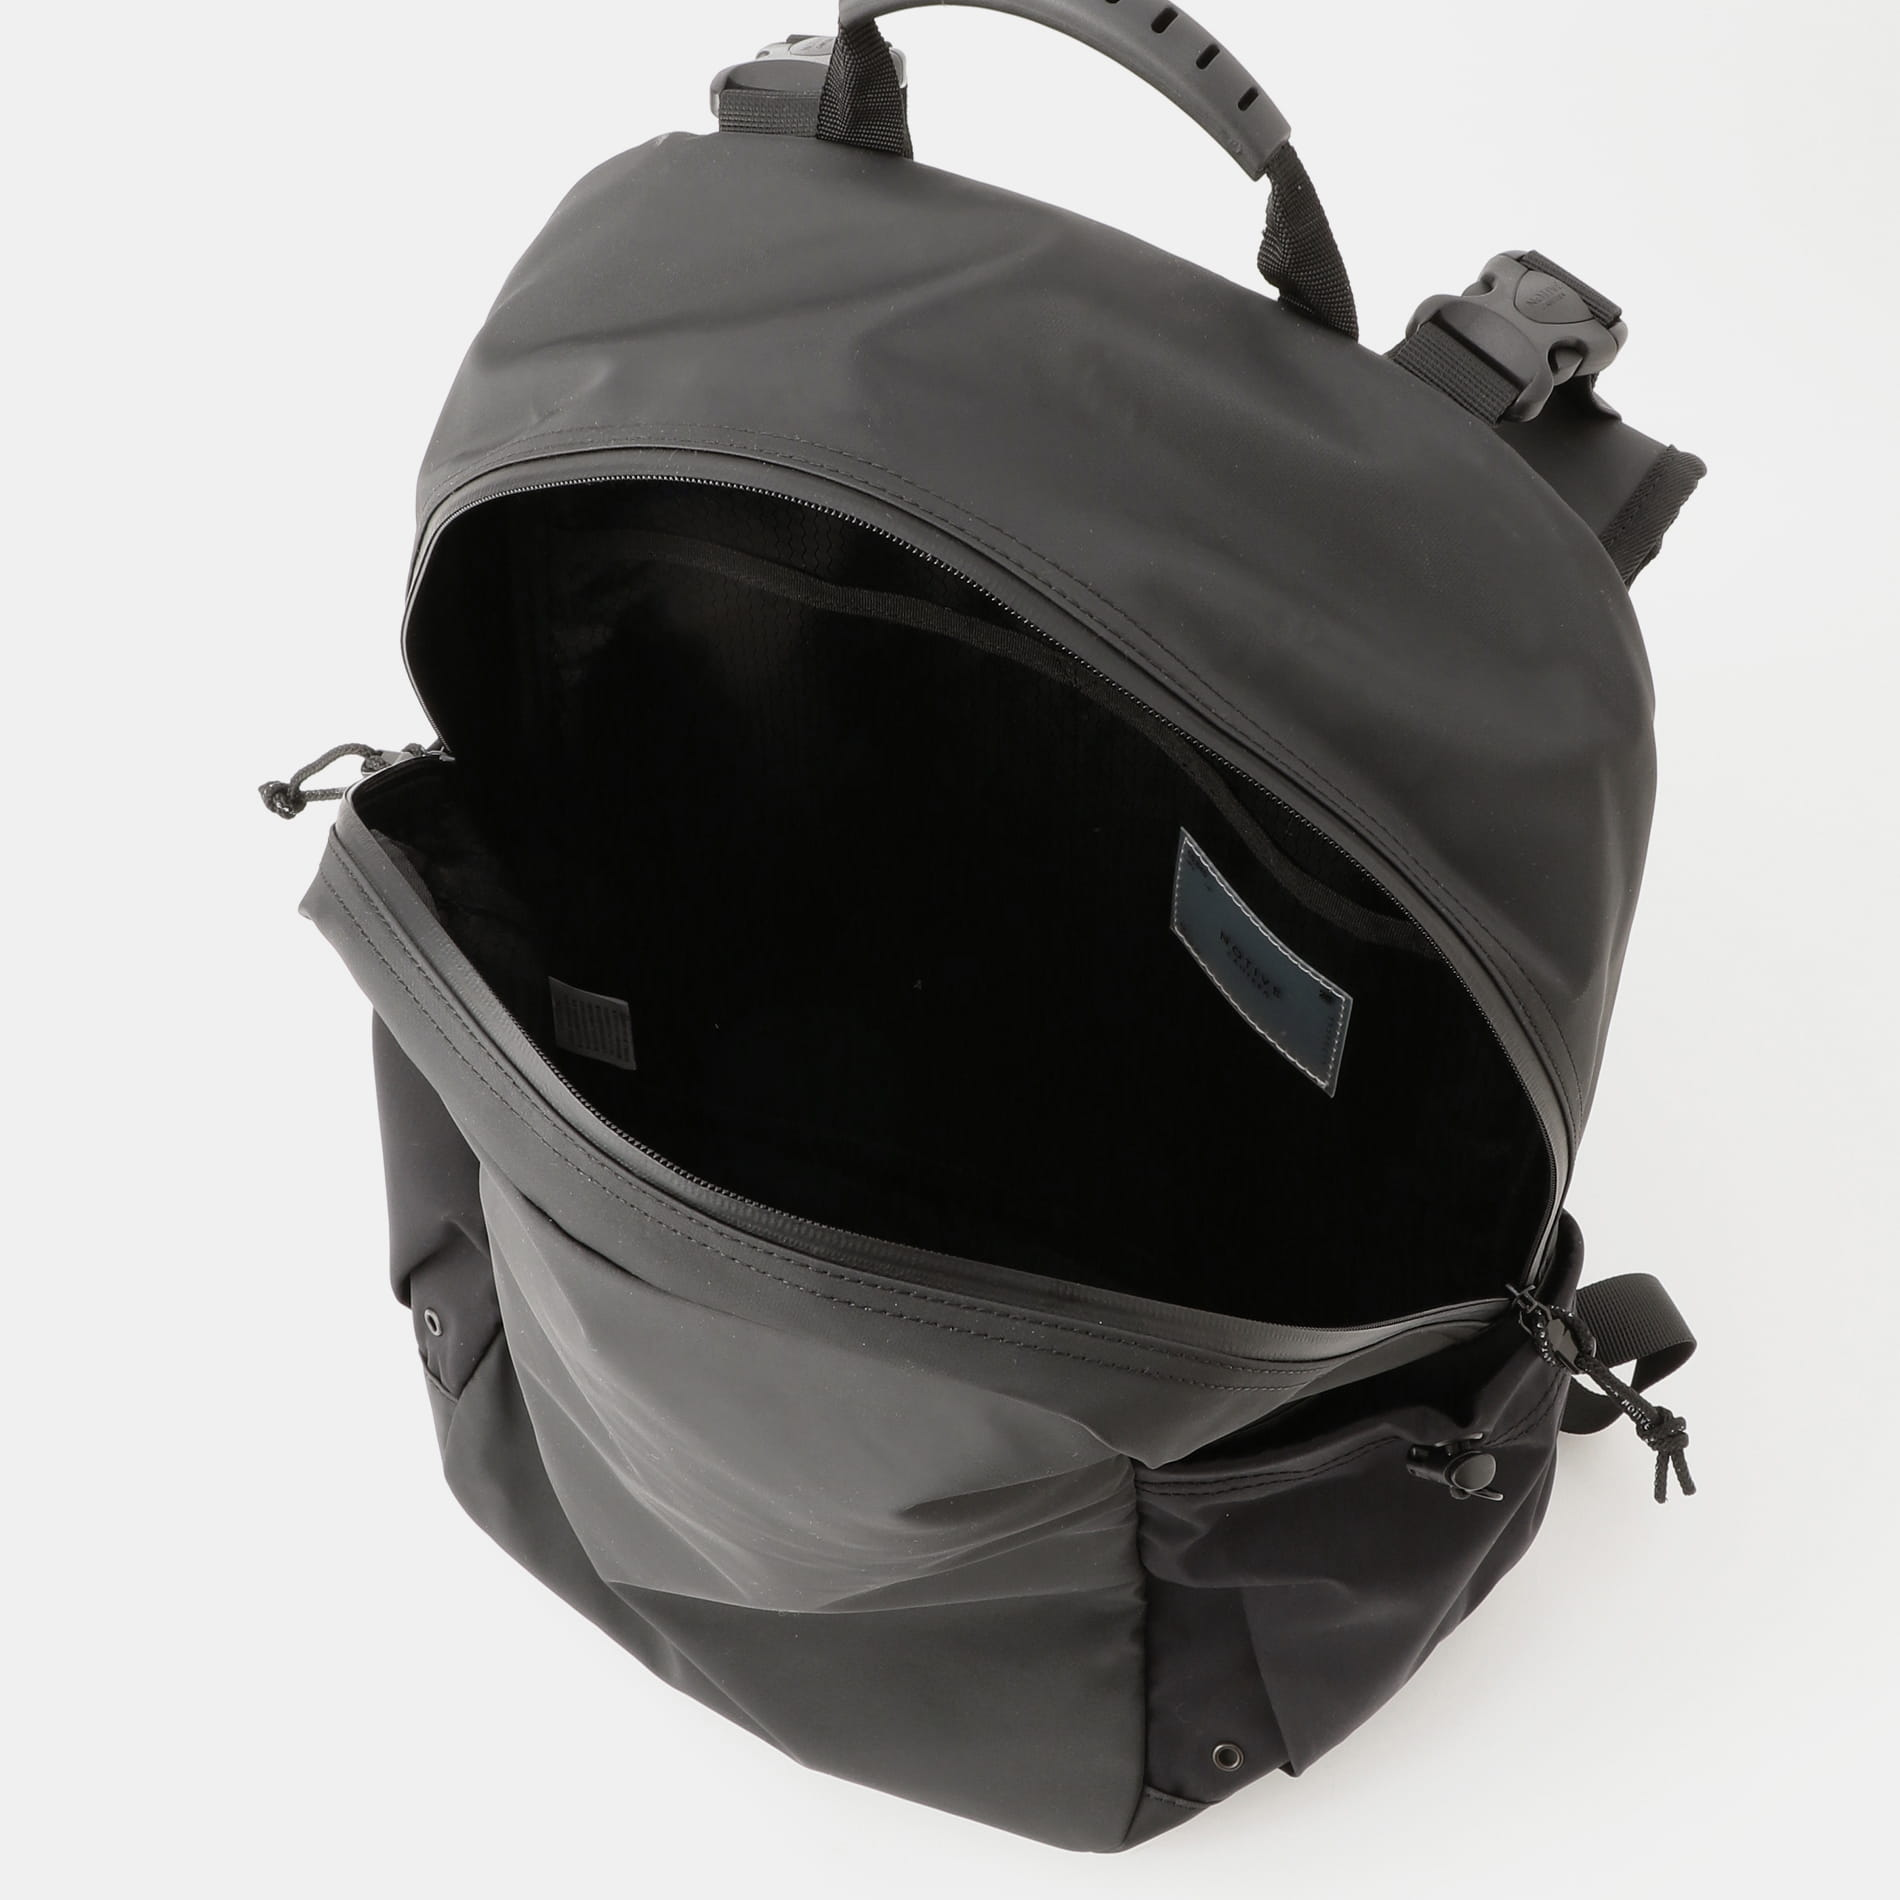 【NOTIVE】MEN MALE (BASIC BACK PACK) NCPA-18